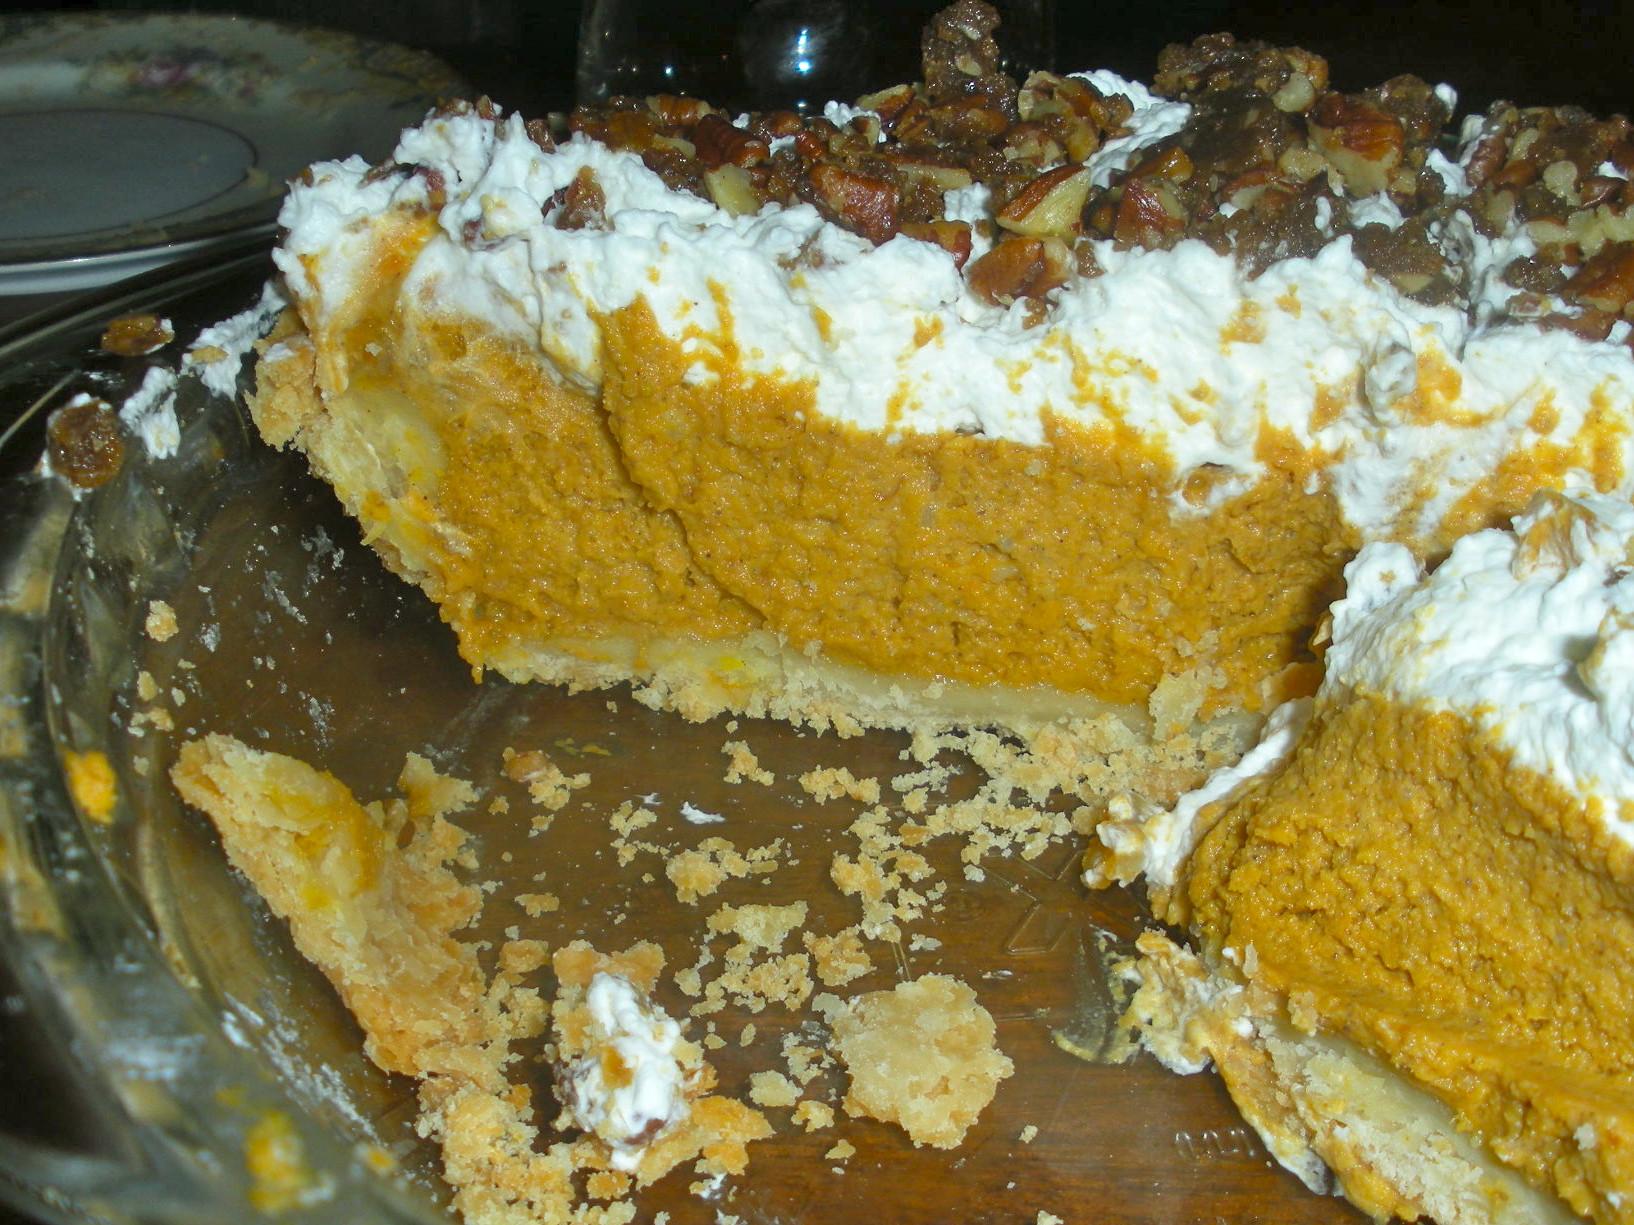 Paula Deen Pumpkin Pie  Paula Deen s Rum Pumpkin Pie with Praline Pecans